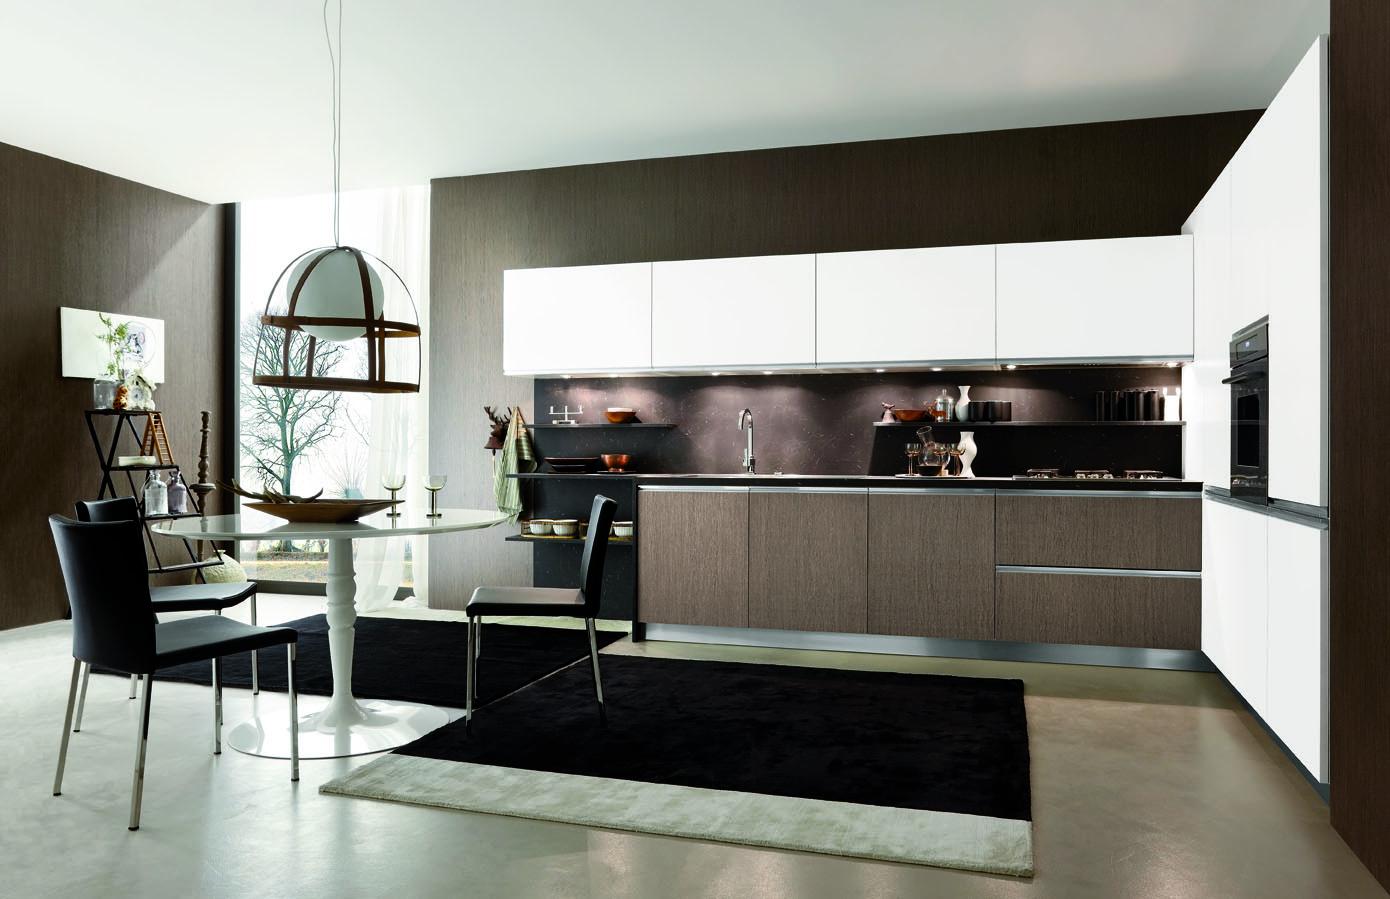 Foto cucina moderna karisma by gicinque arredamento for Arredamento cucina moderna